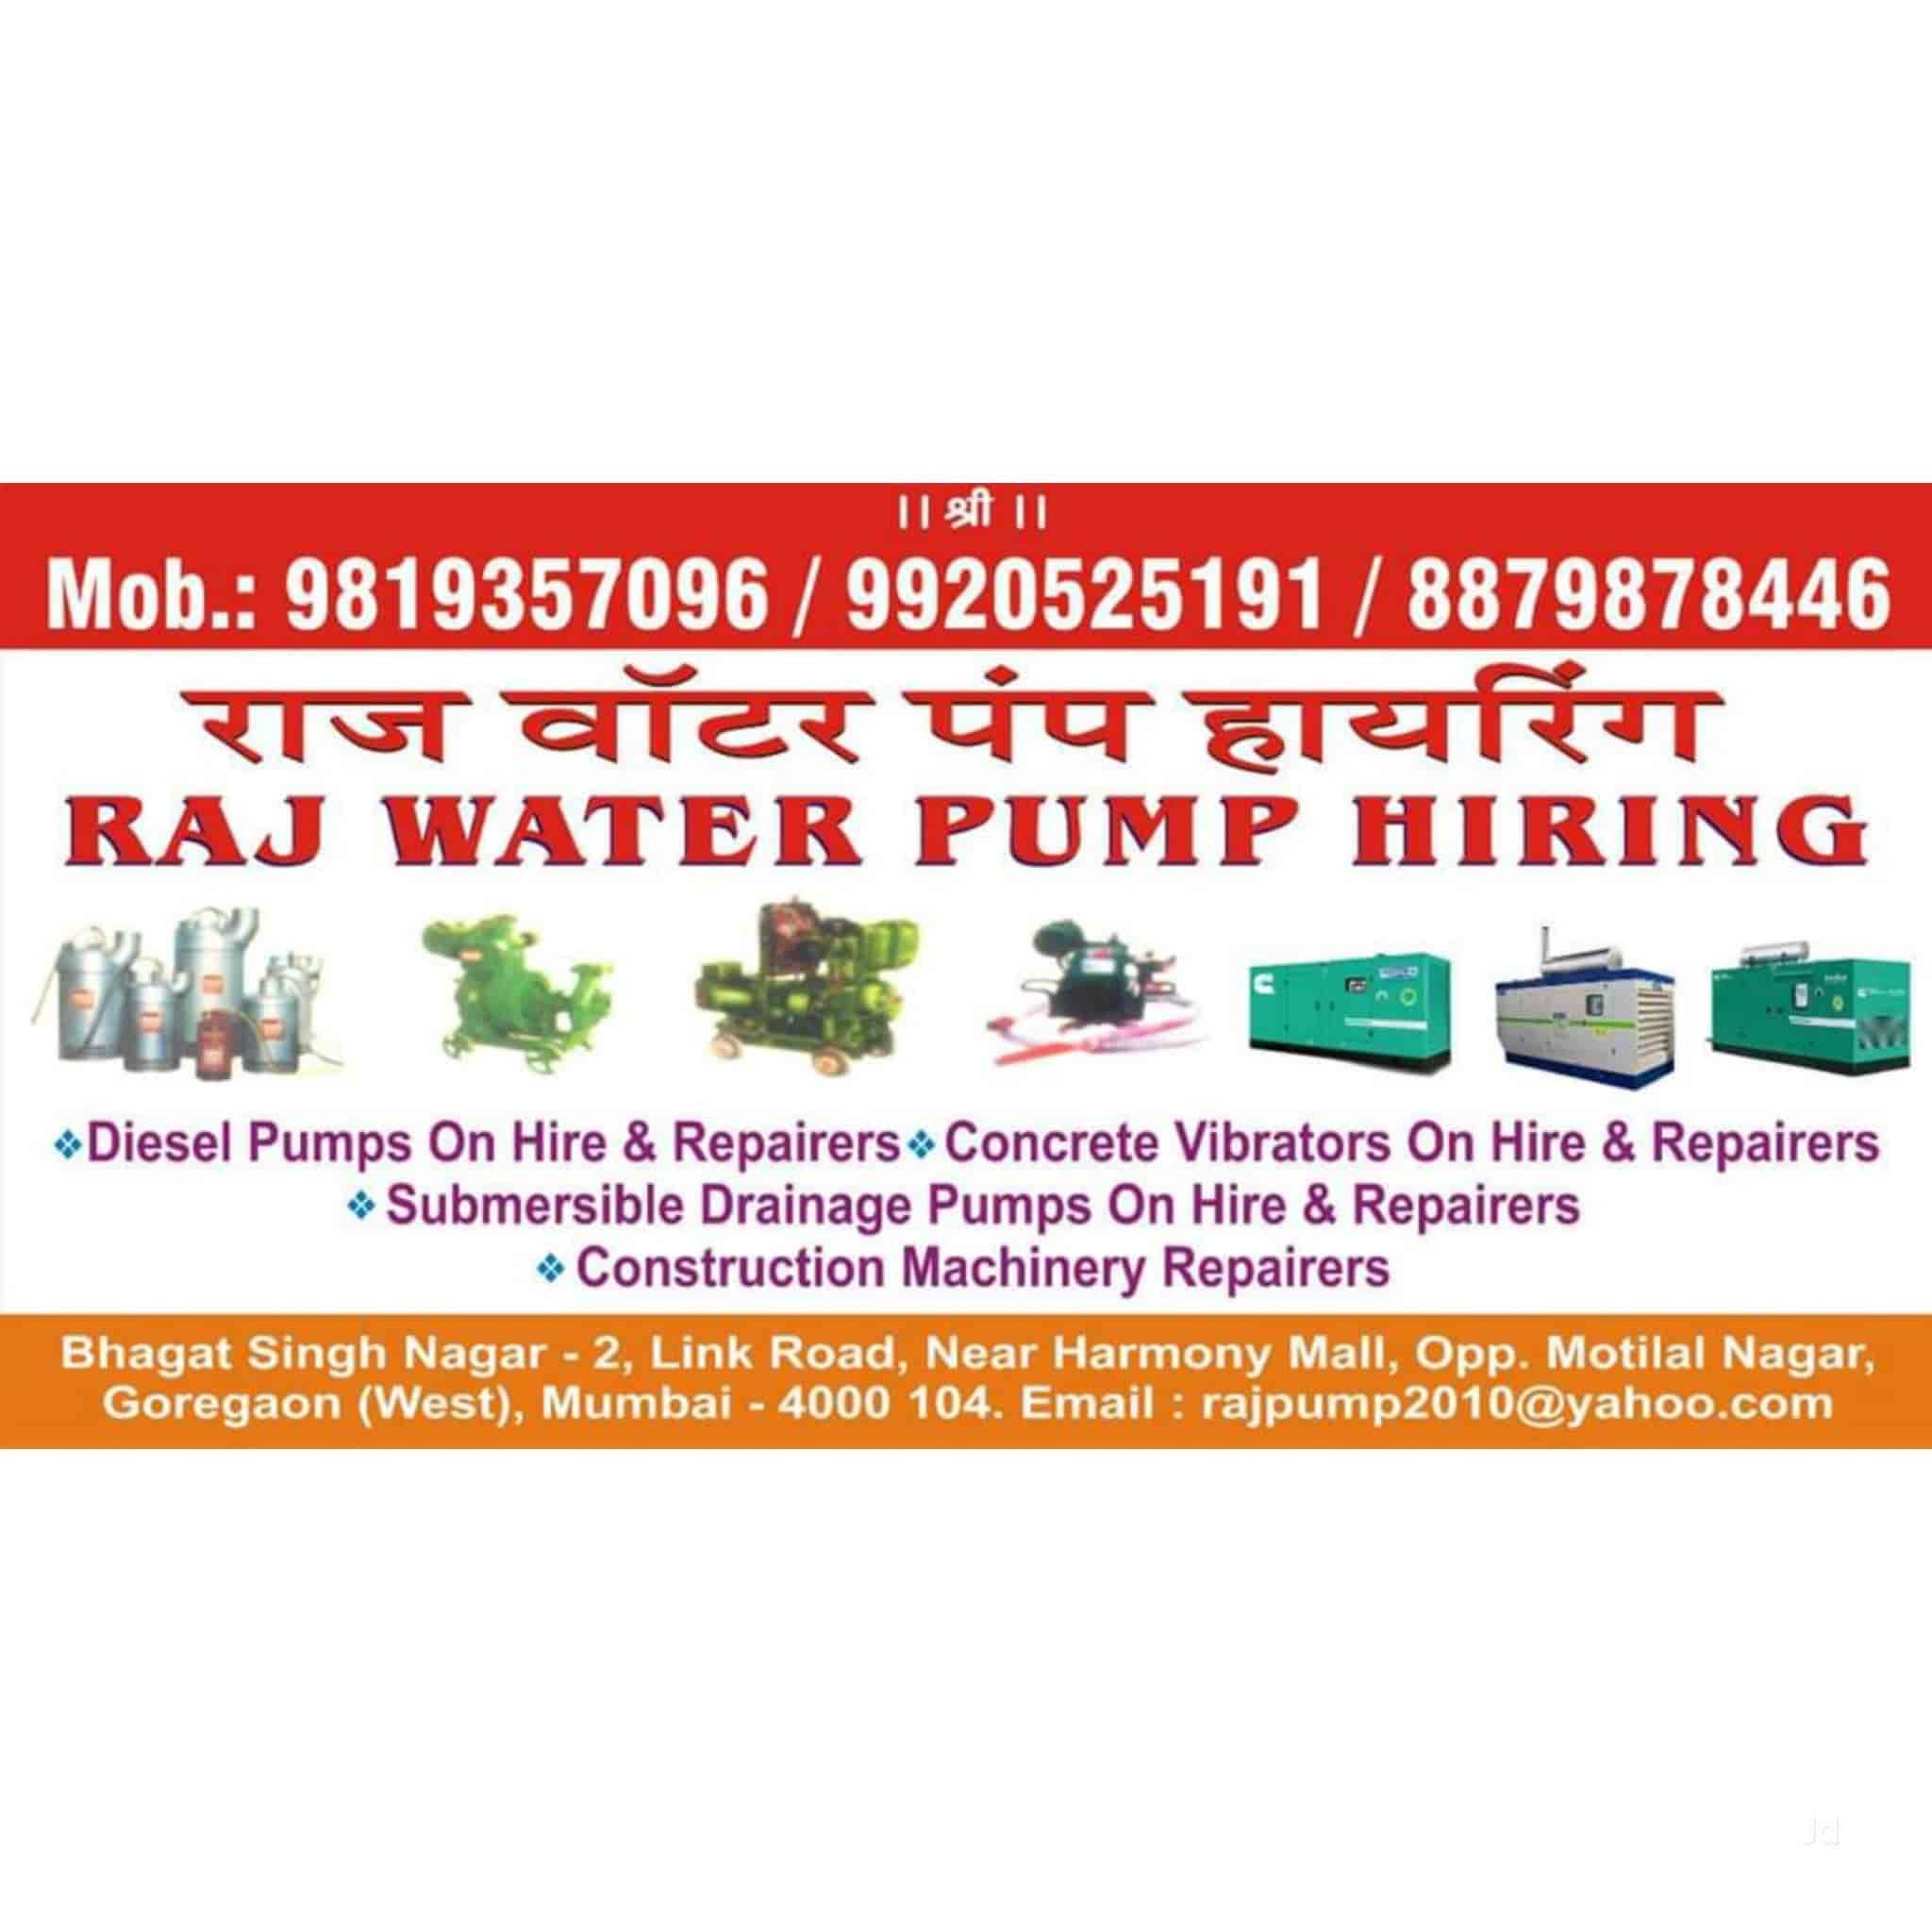 Raj Water Pump Hiring